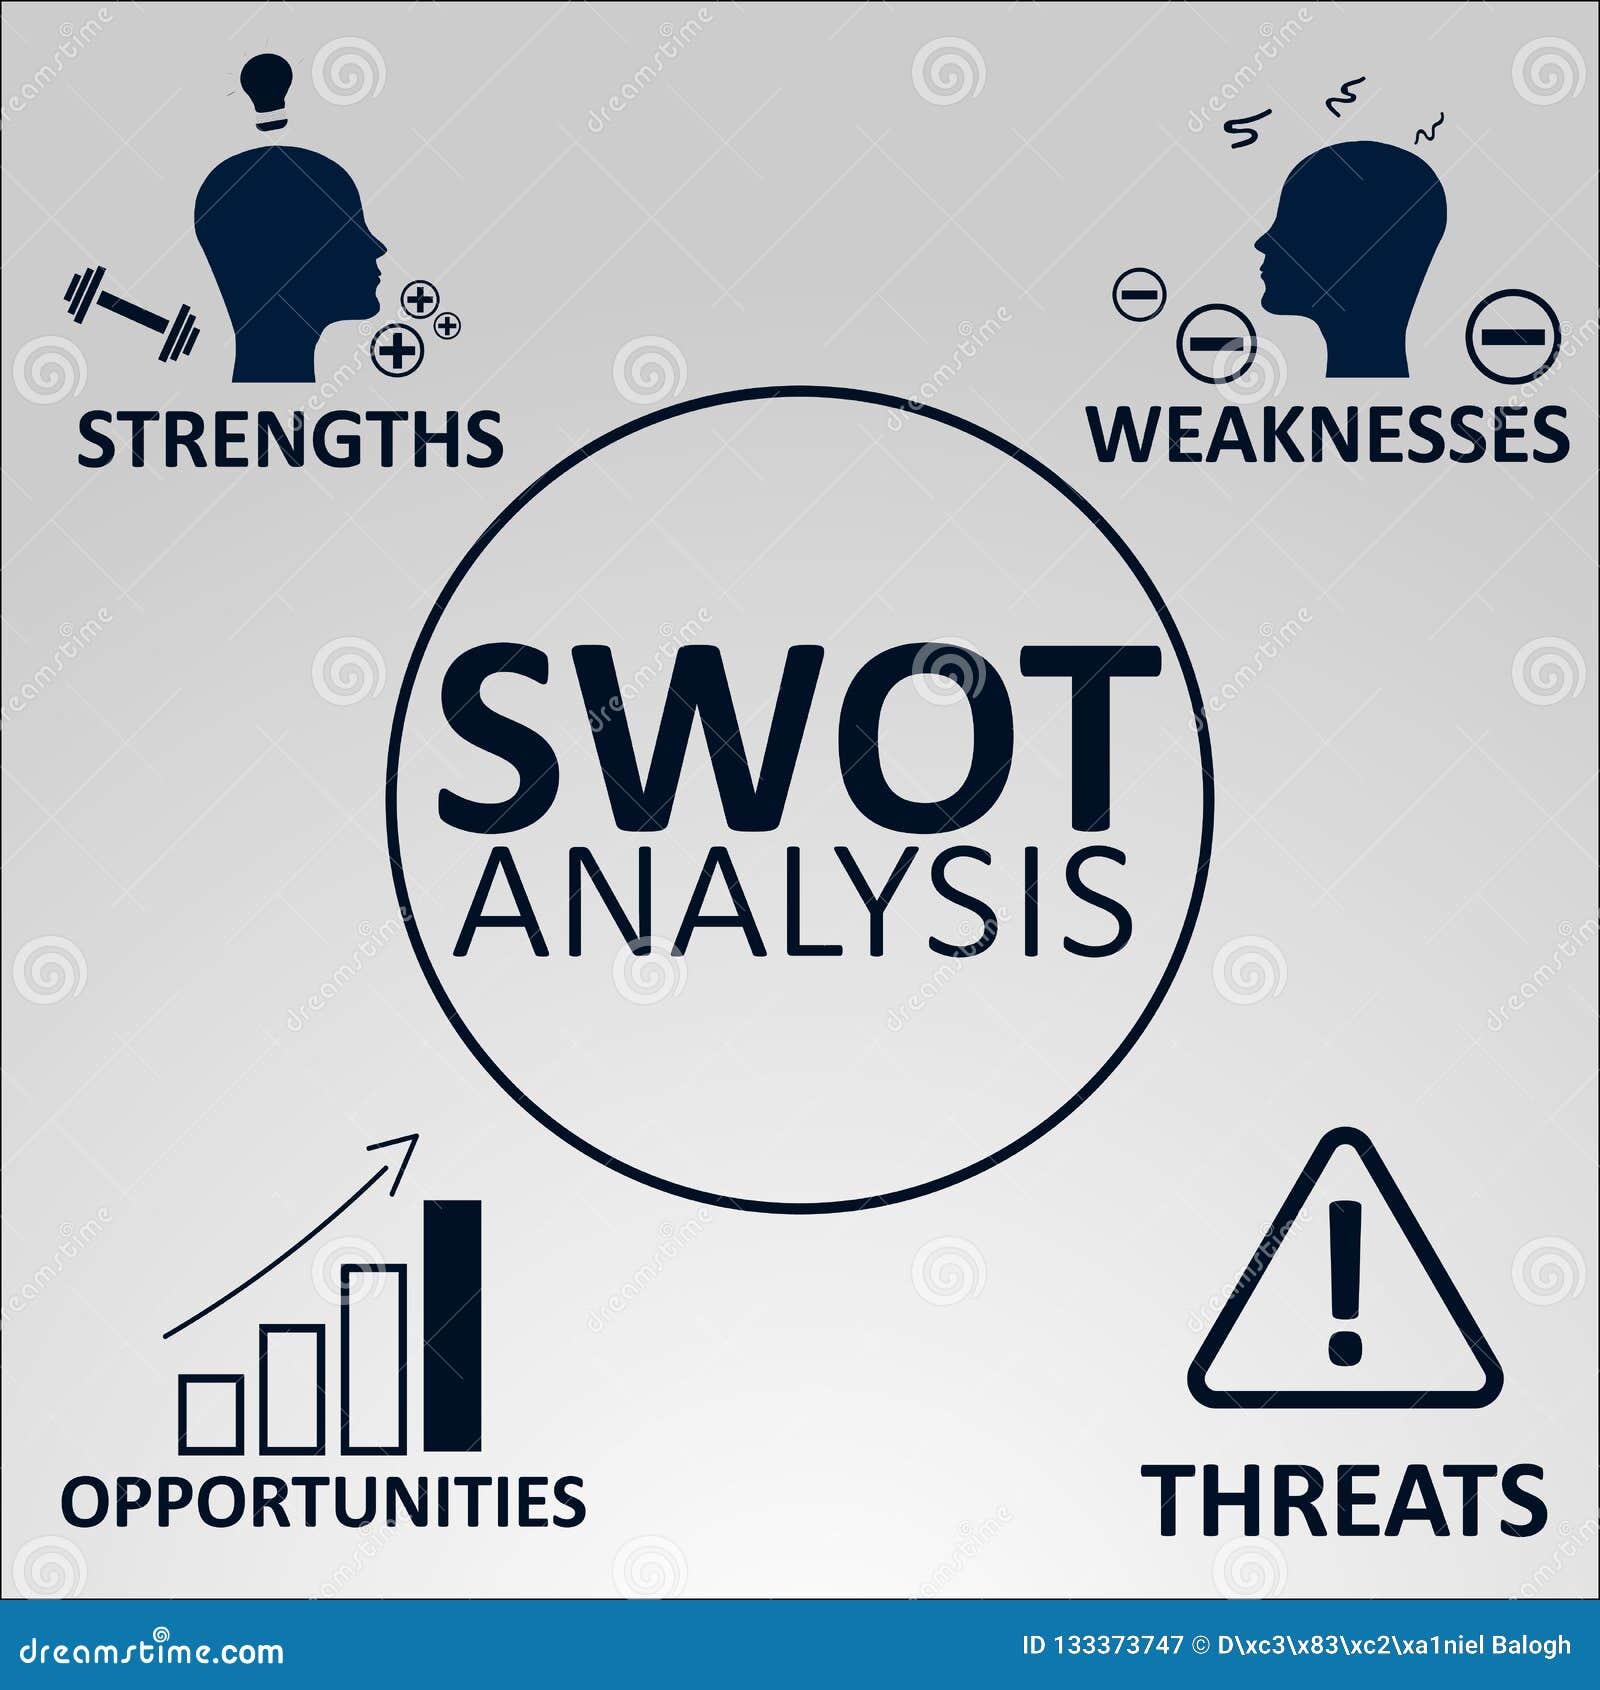 strengths weaknesses opportunities threats